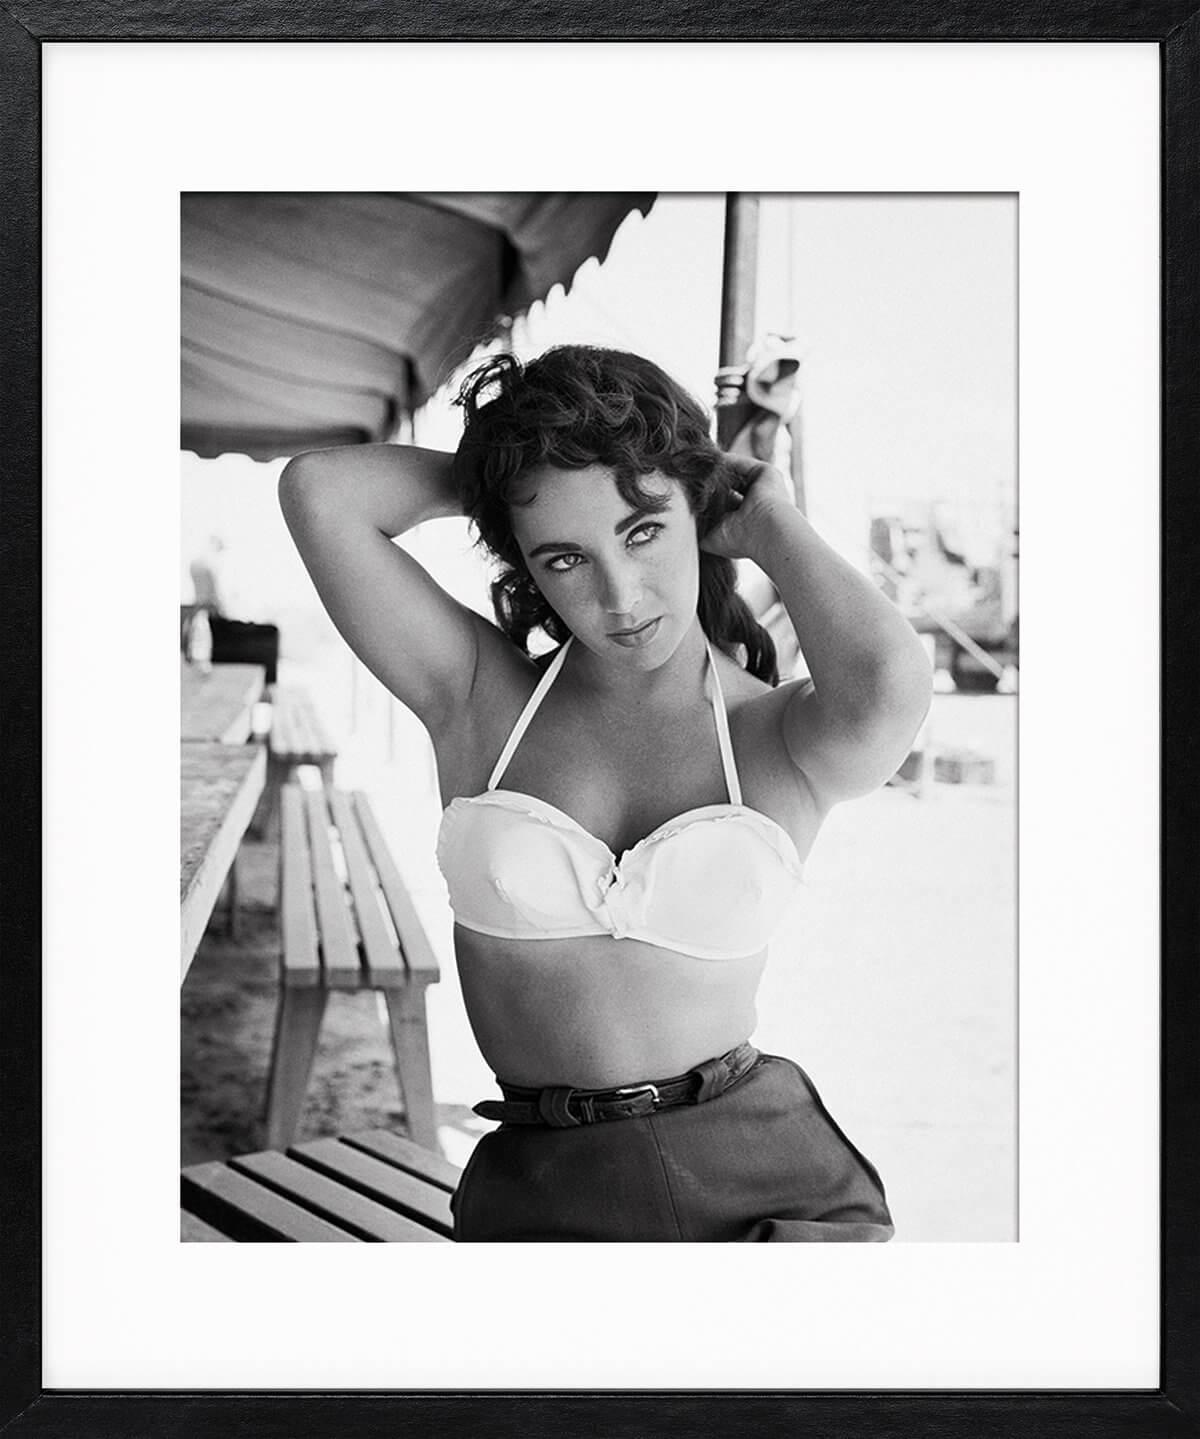 Frank Worth: Elizabeth Taylor with Hands behind Head 1955